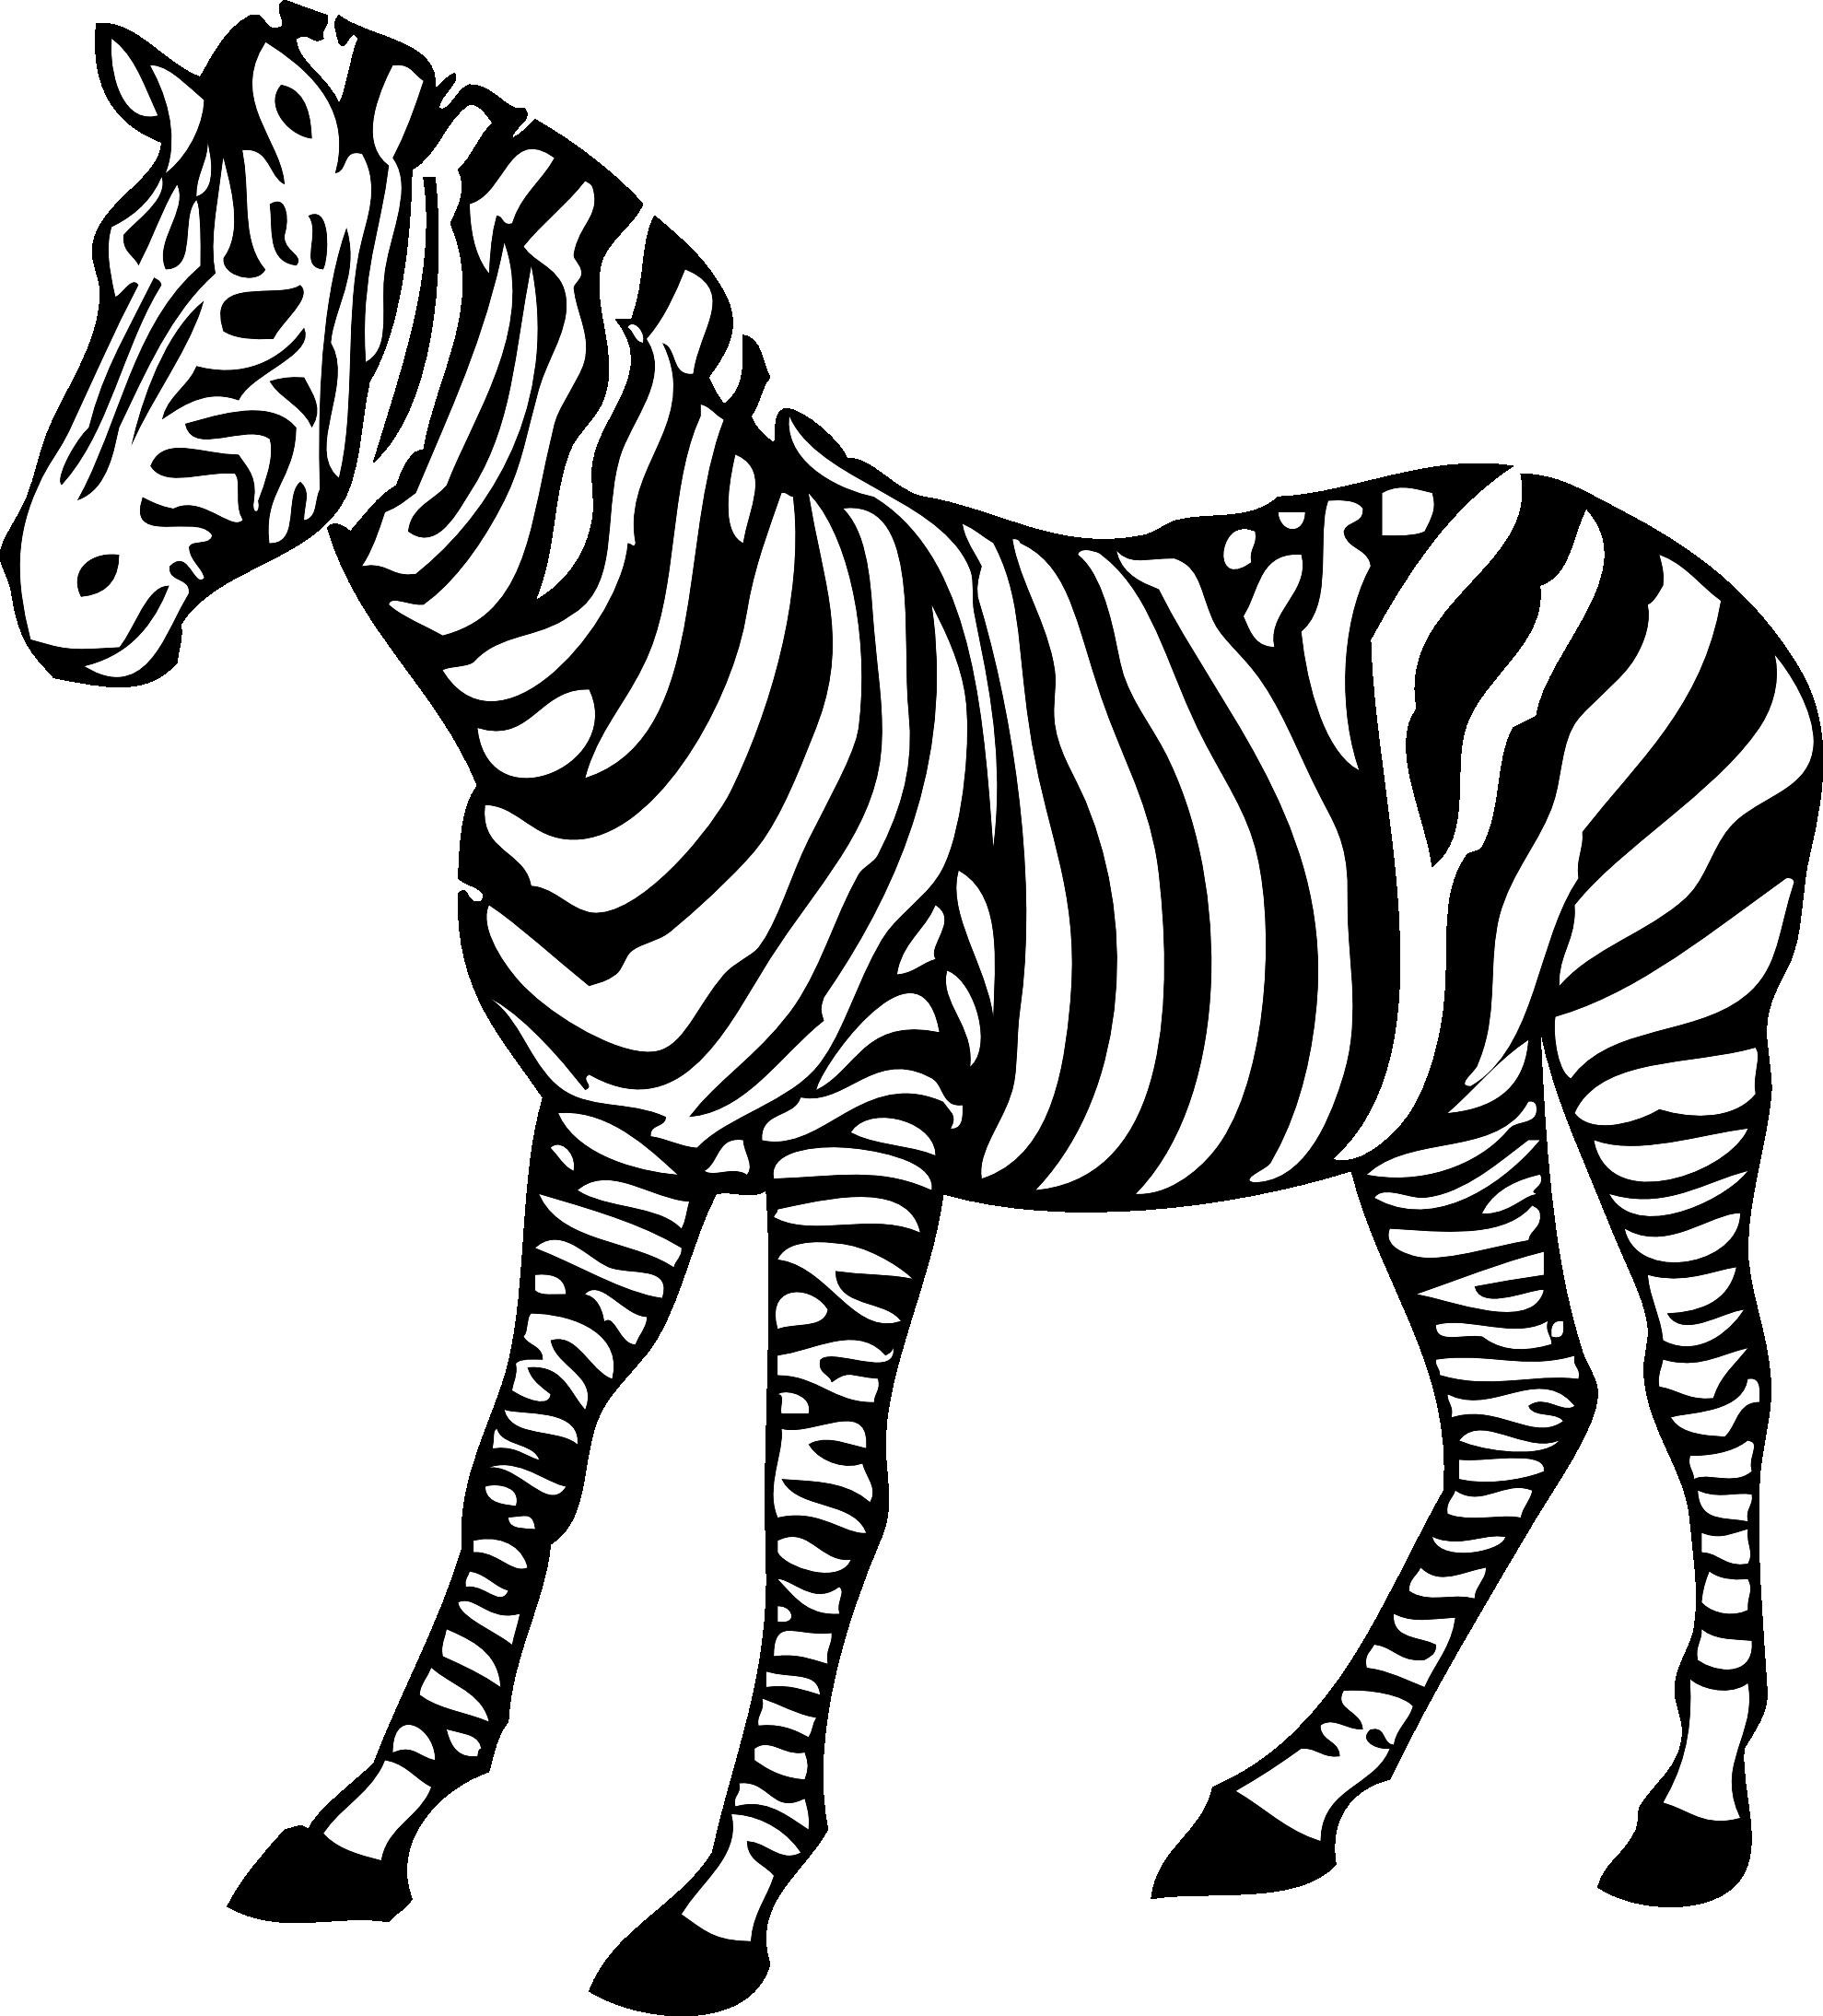 1979x2188 Coloring Pages Zebra Print New Ravishing Zebra To Print Coloring